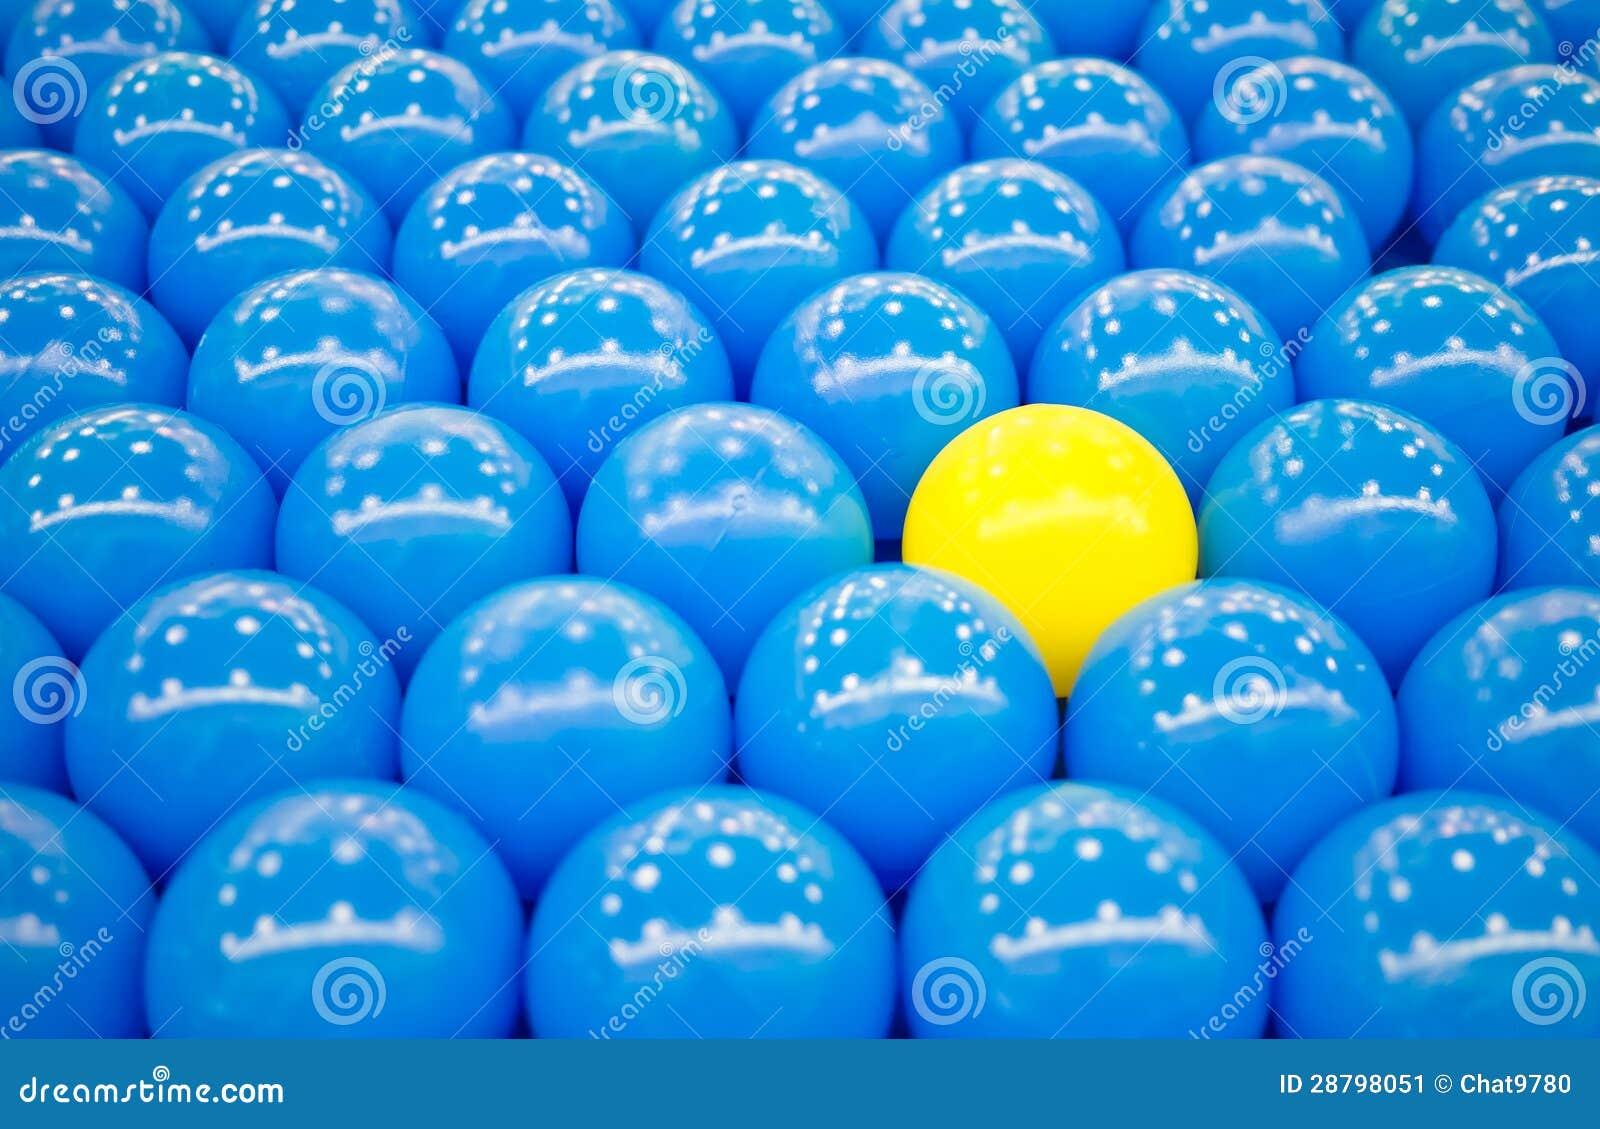 Fotos De Stock Chat9780: Bola Amarilla única Entre Bolas Azules Imagen De Archivo